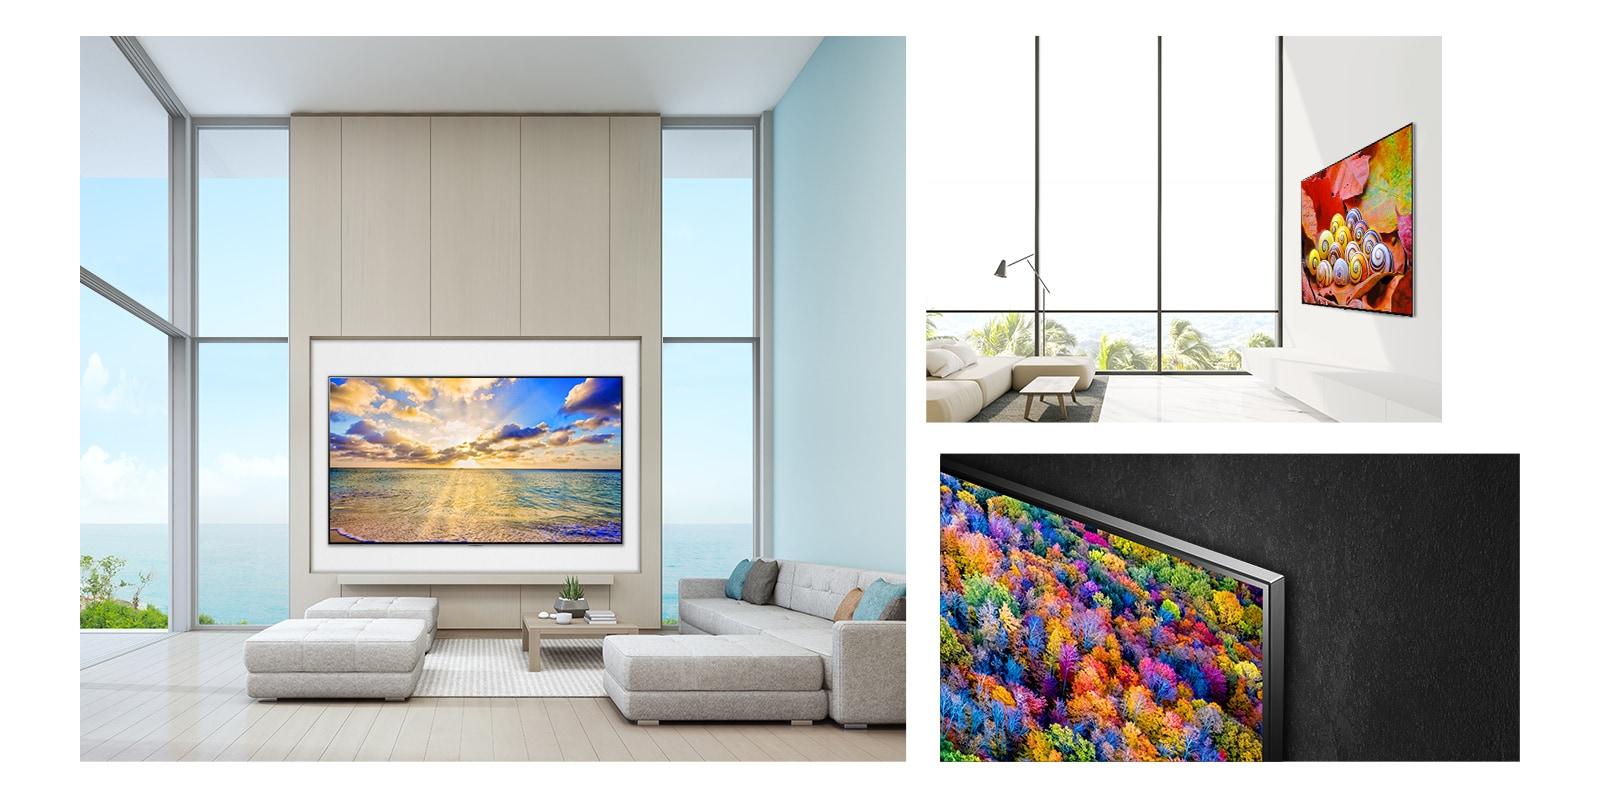 TV-NanoCell-07-Gallery-design-Desktop